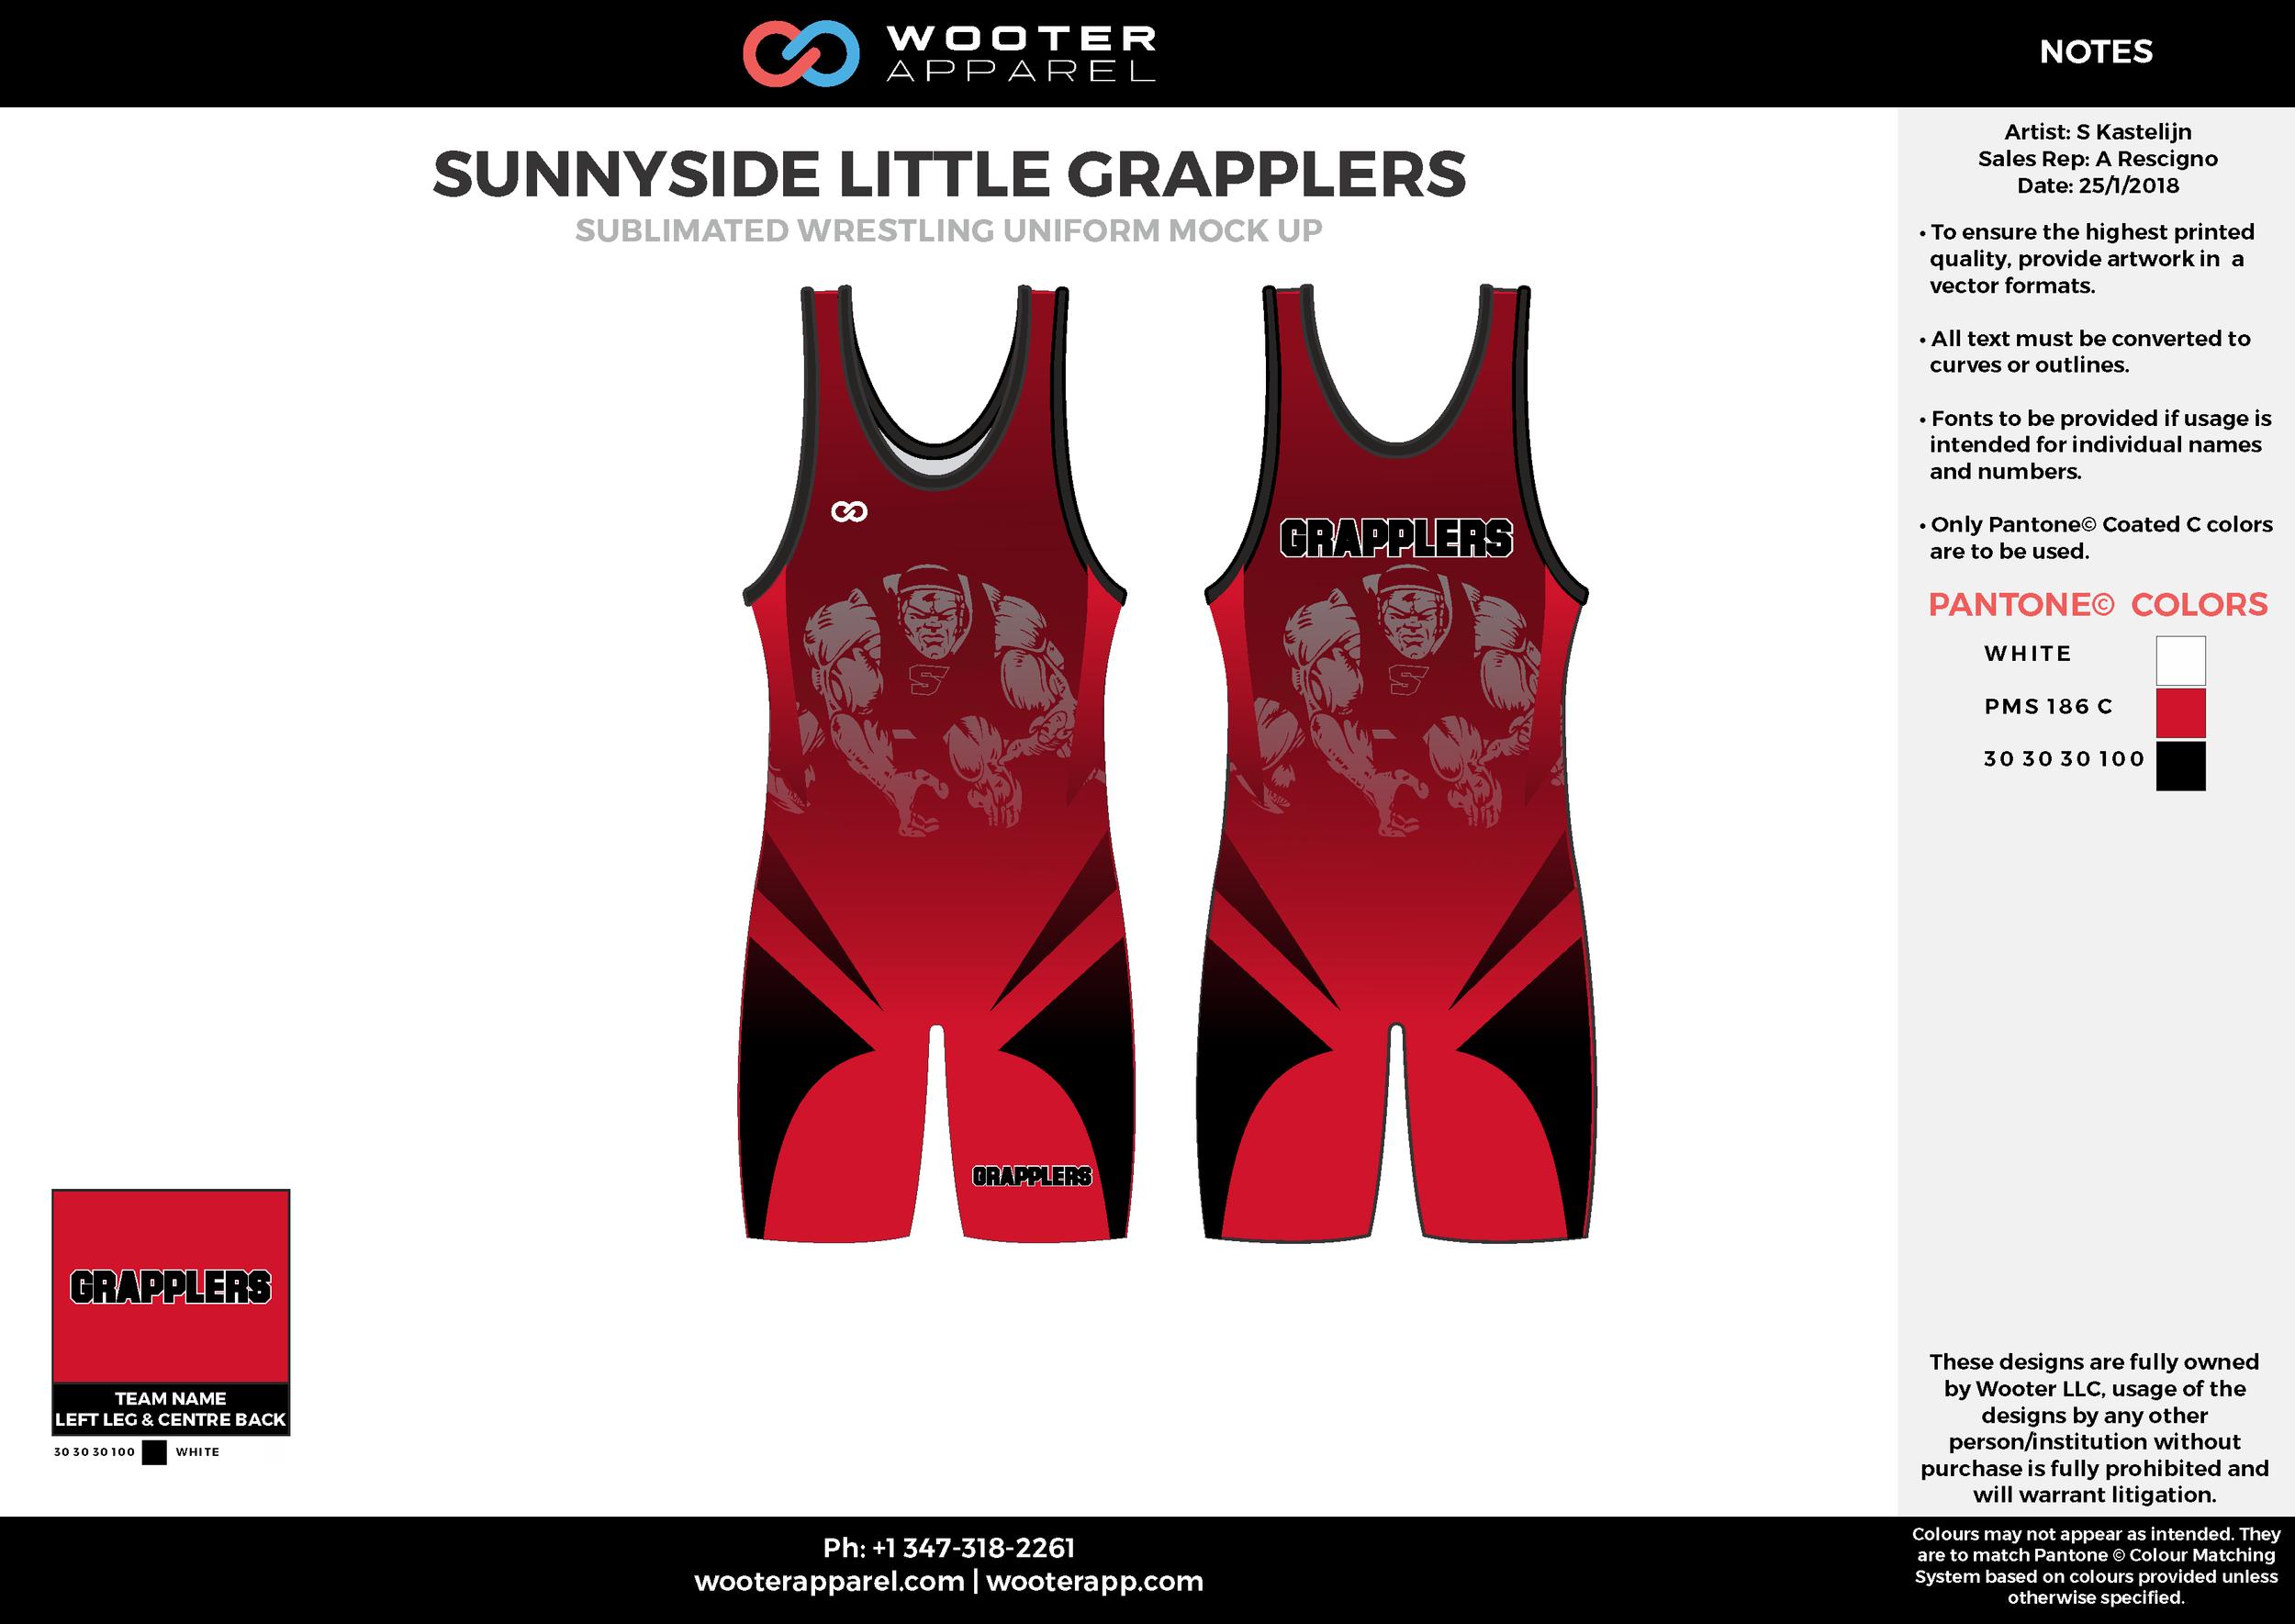 SUNNYSIDE LITTLE GRAPPLERS White Black Red Sublimated Wrestling Uniform